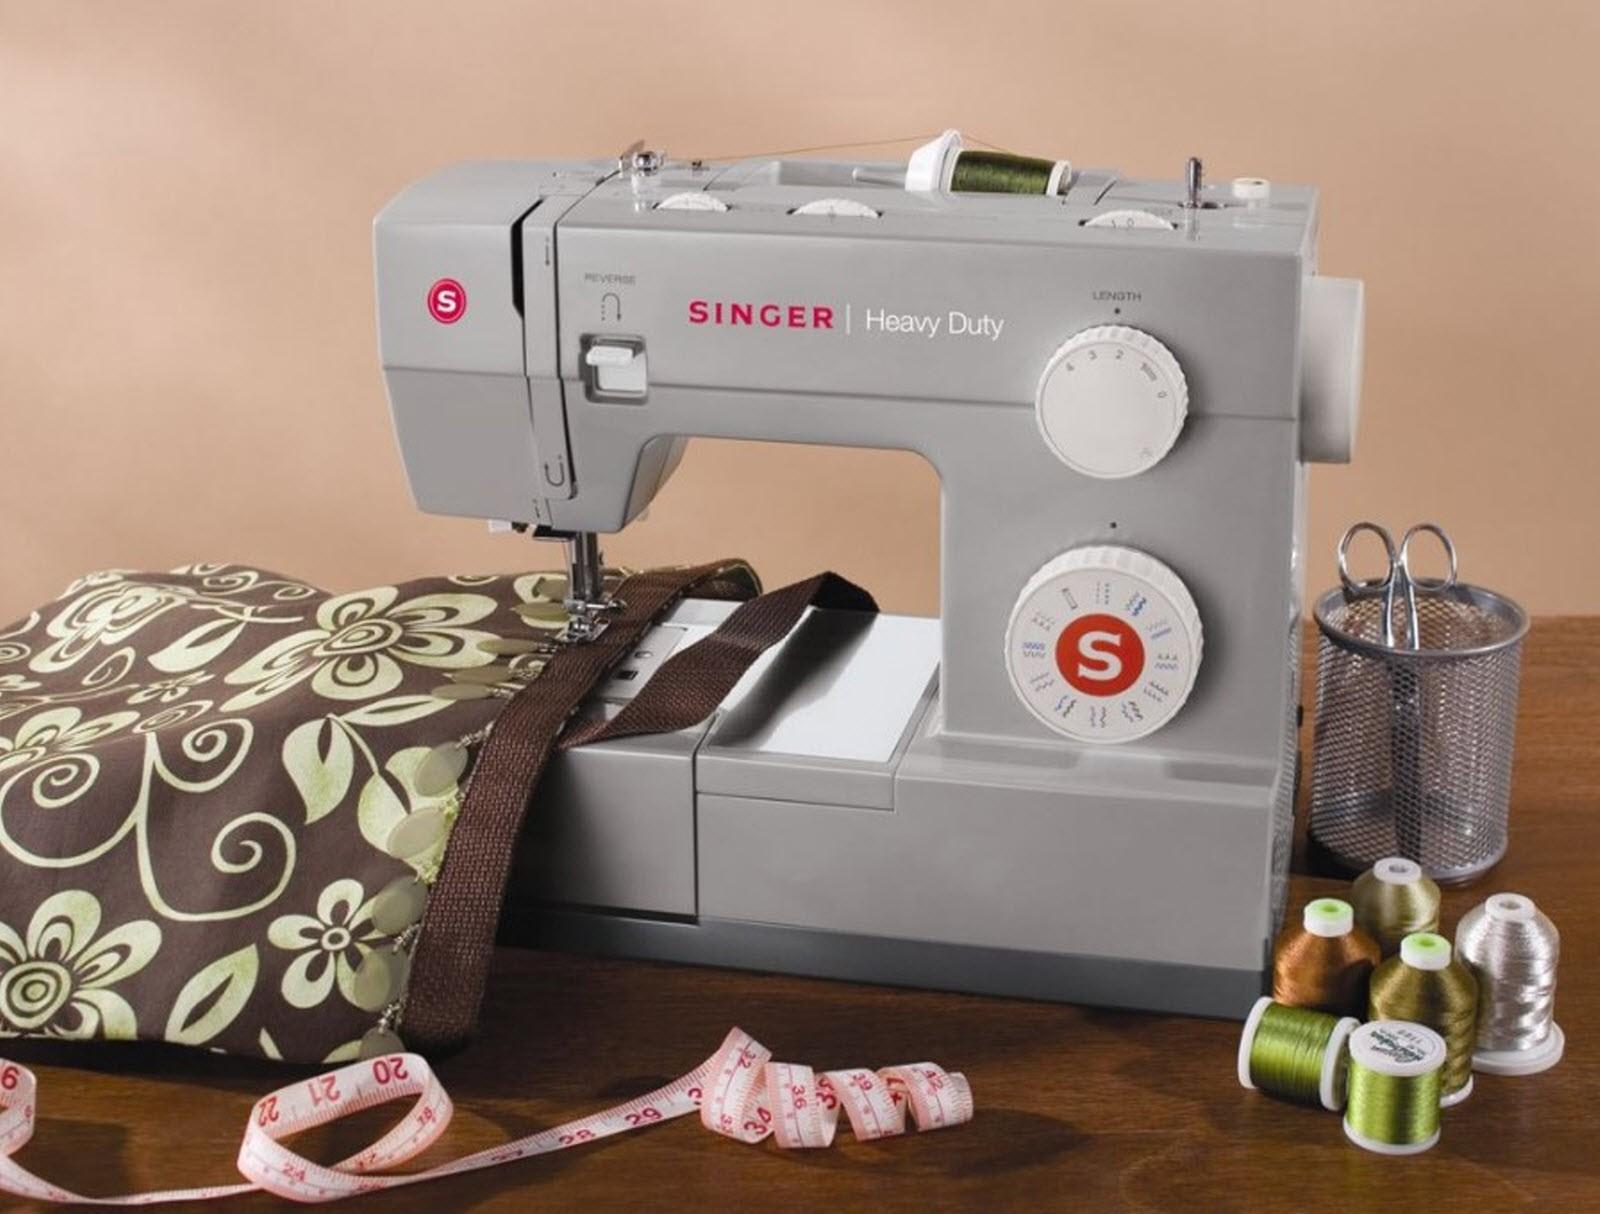 Singer-heavy-duty-sewing-machine